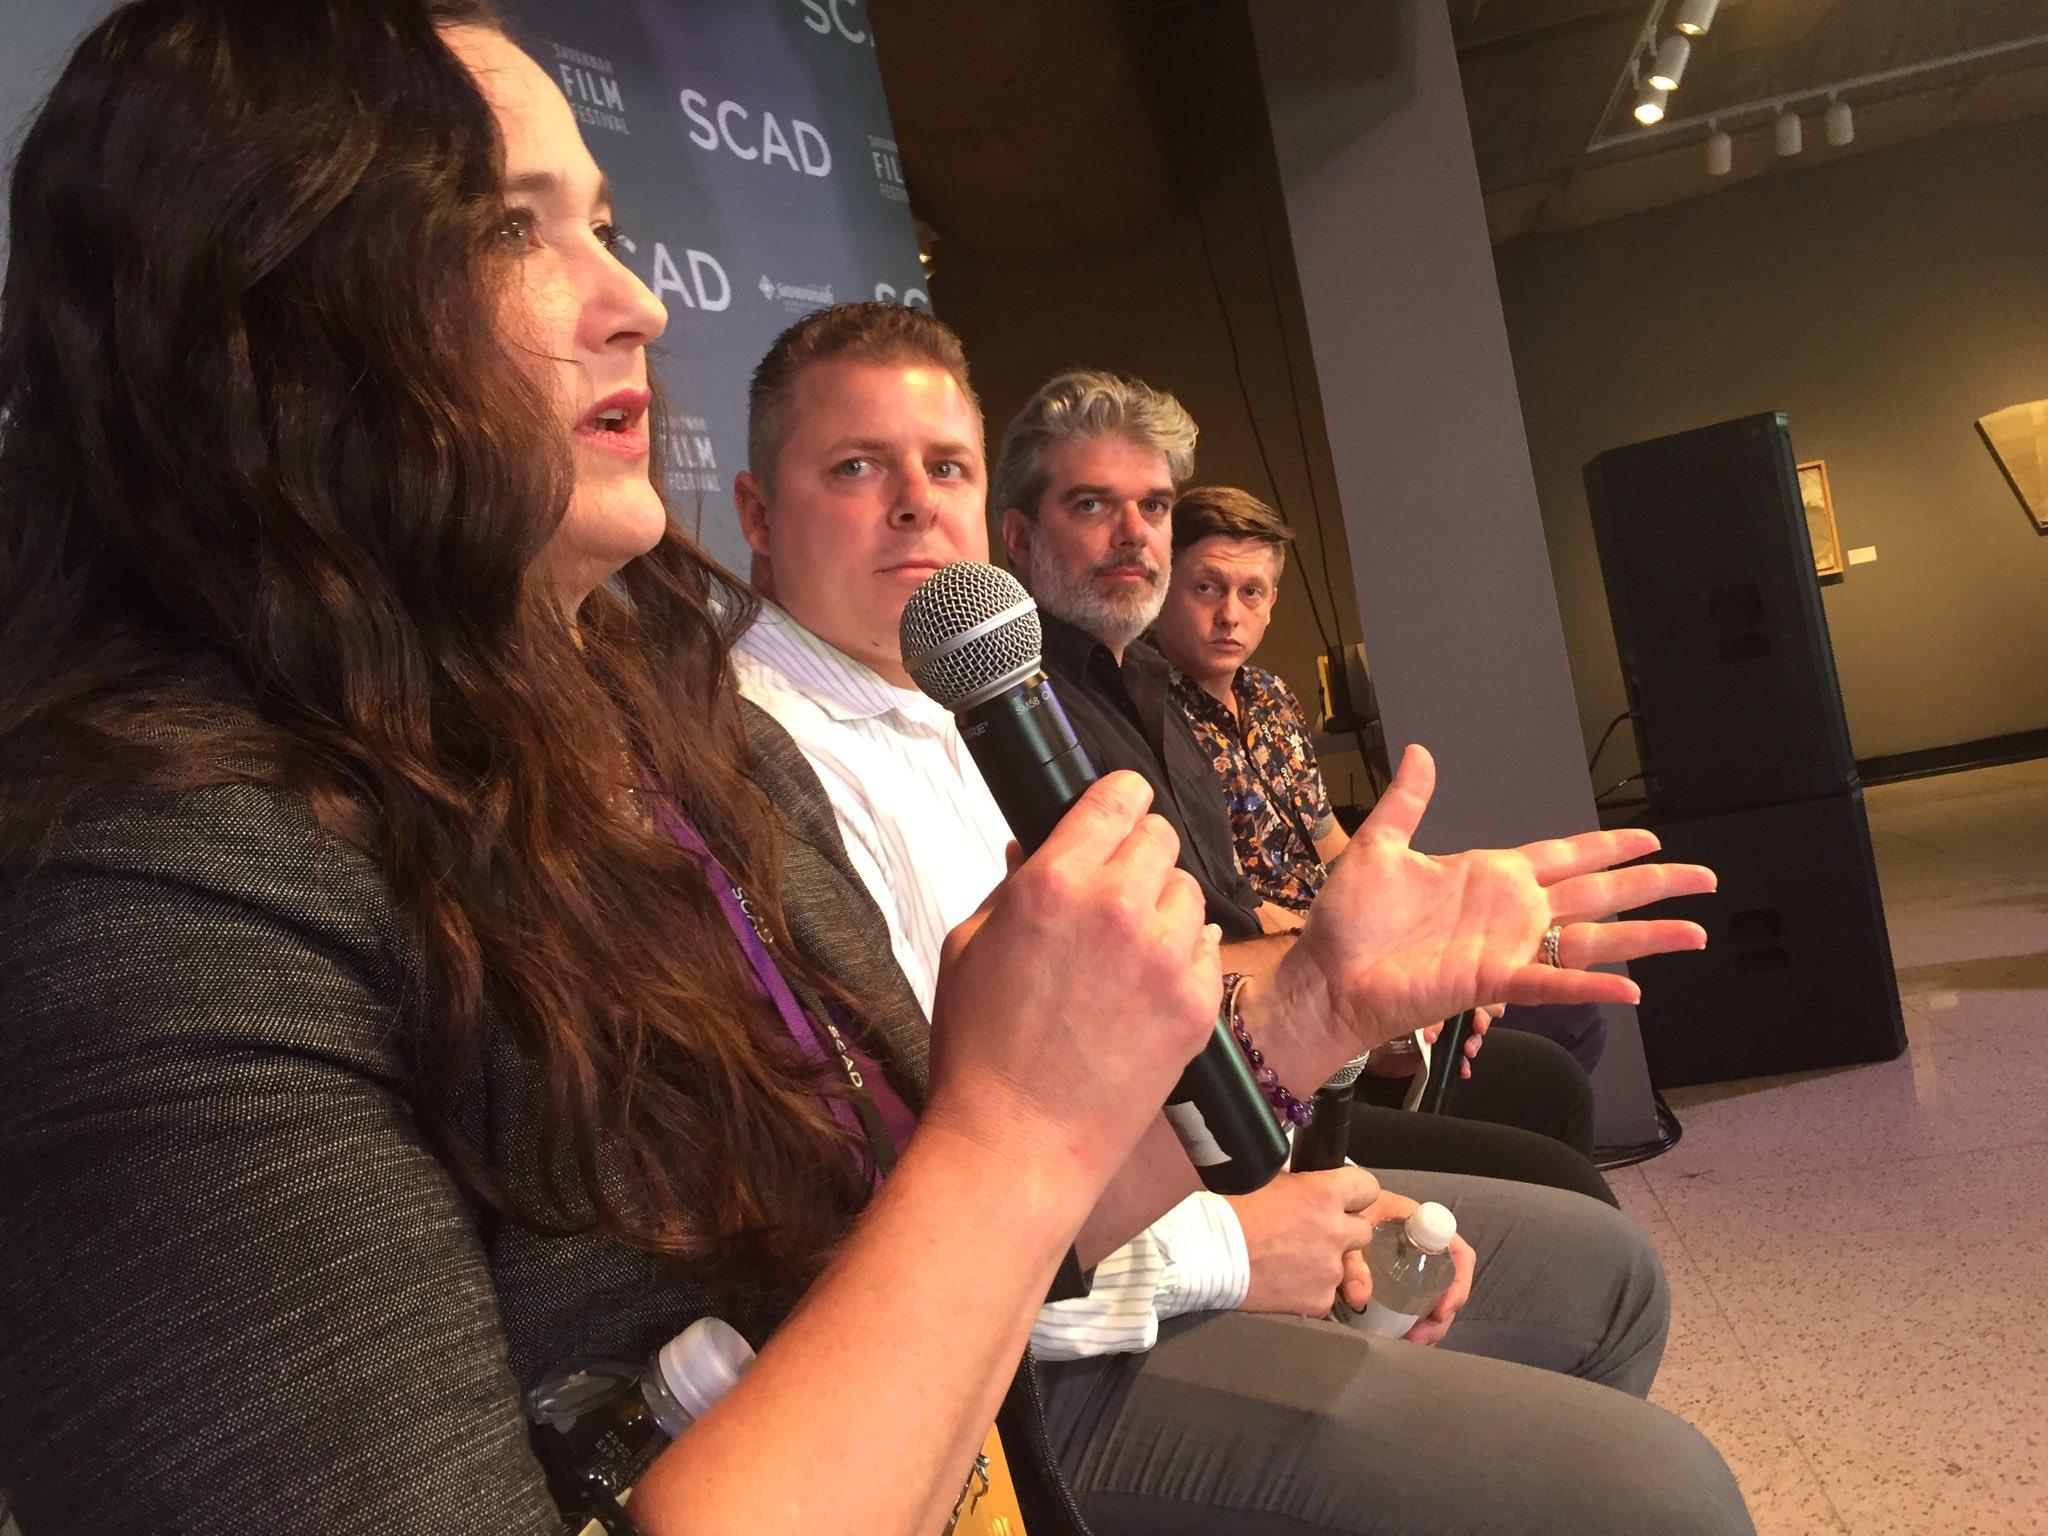 Terrific conversation on ethics at today's #VR panel at the @savfilmfest Savannah film Festival #savff https://t.co/KIarzf8qs4